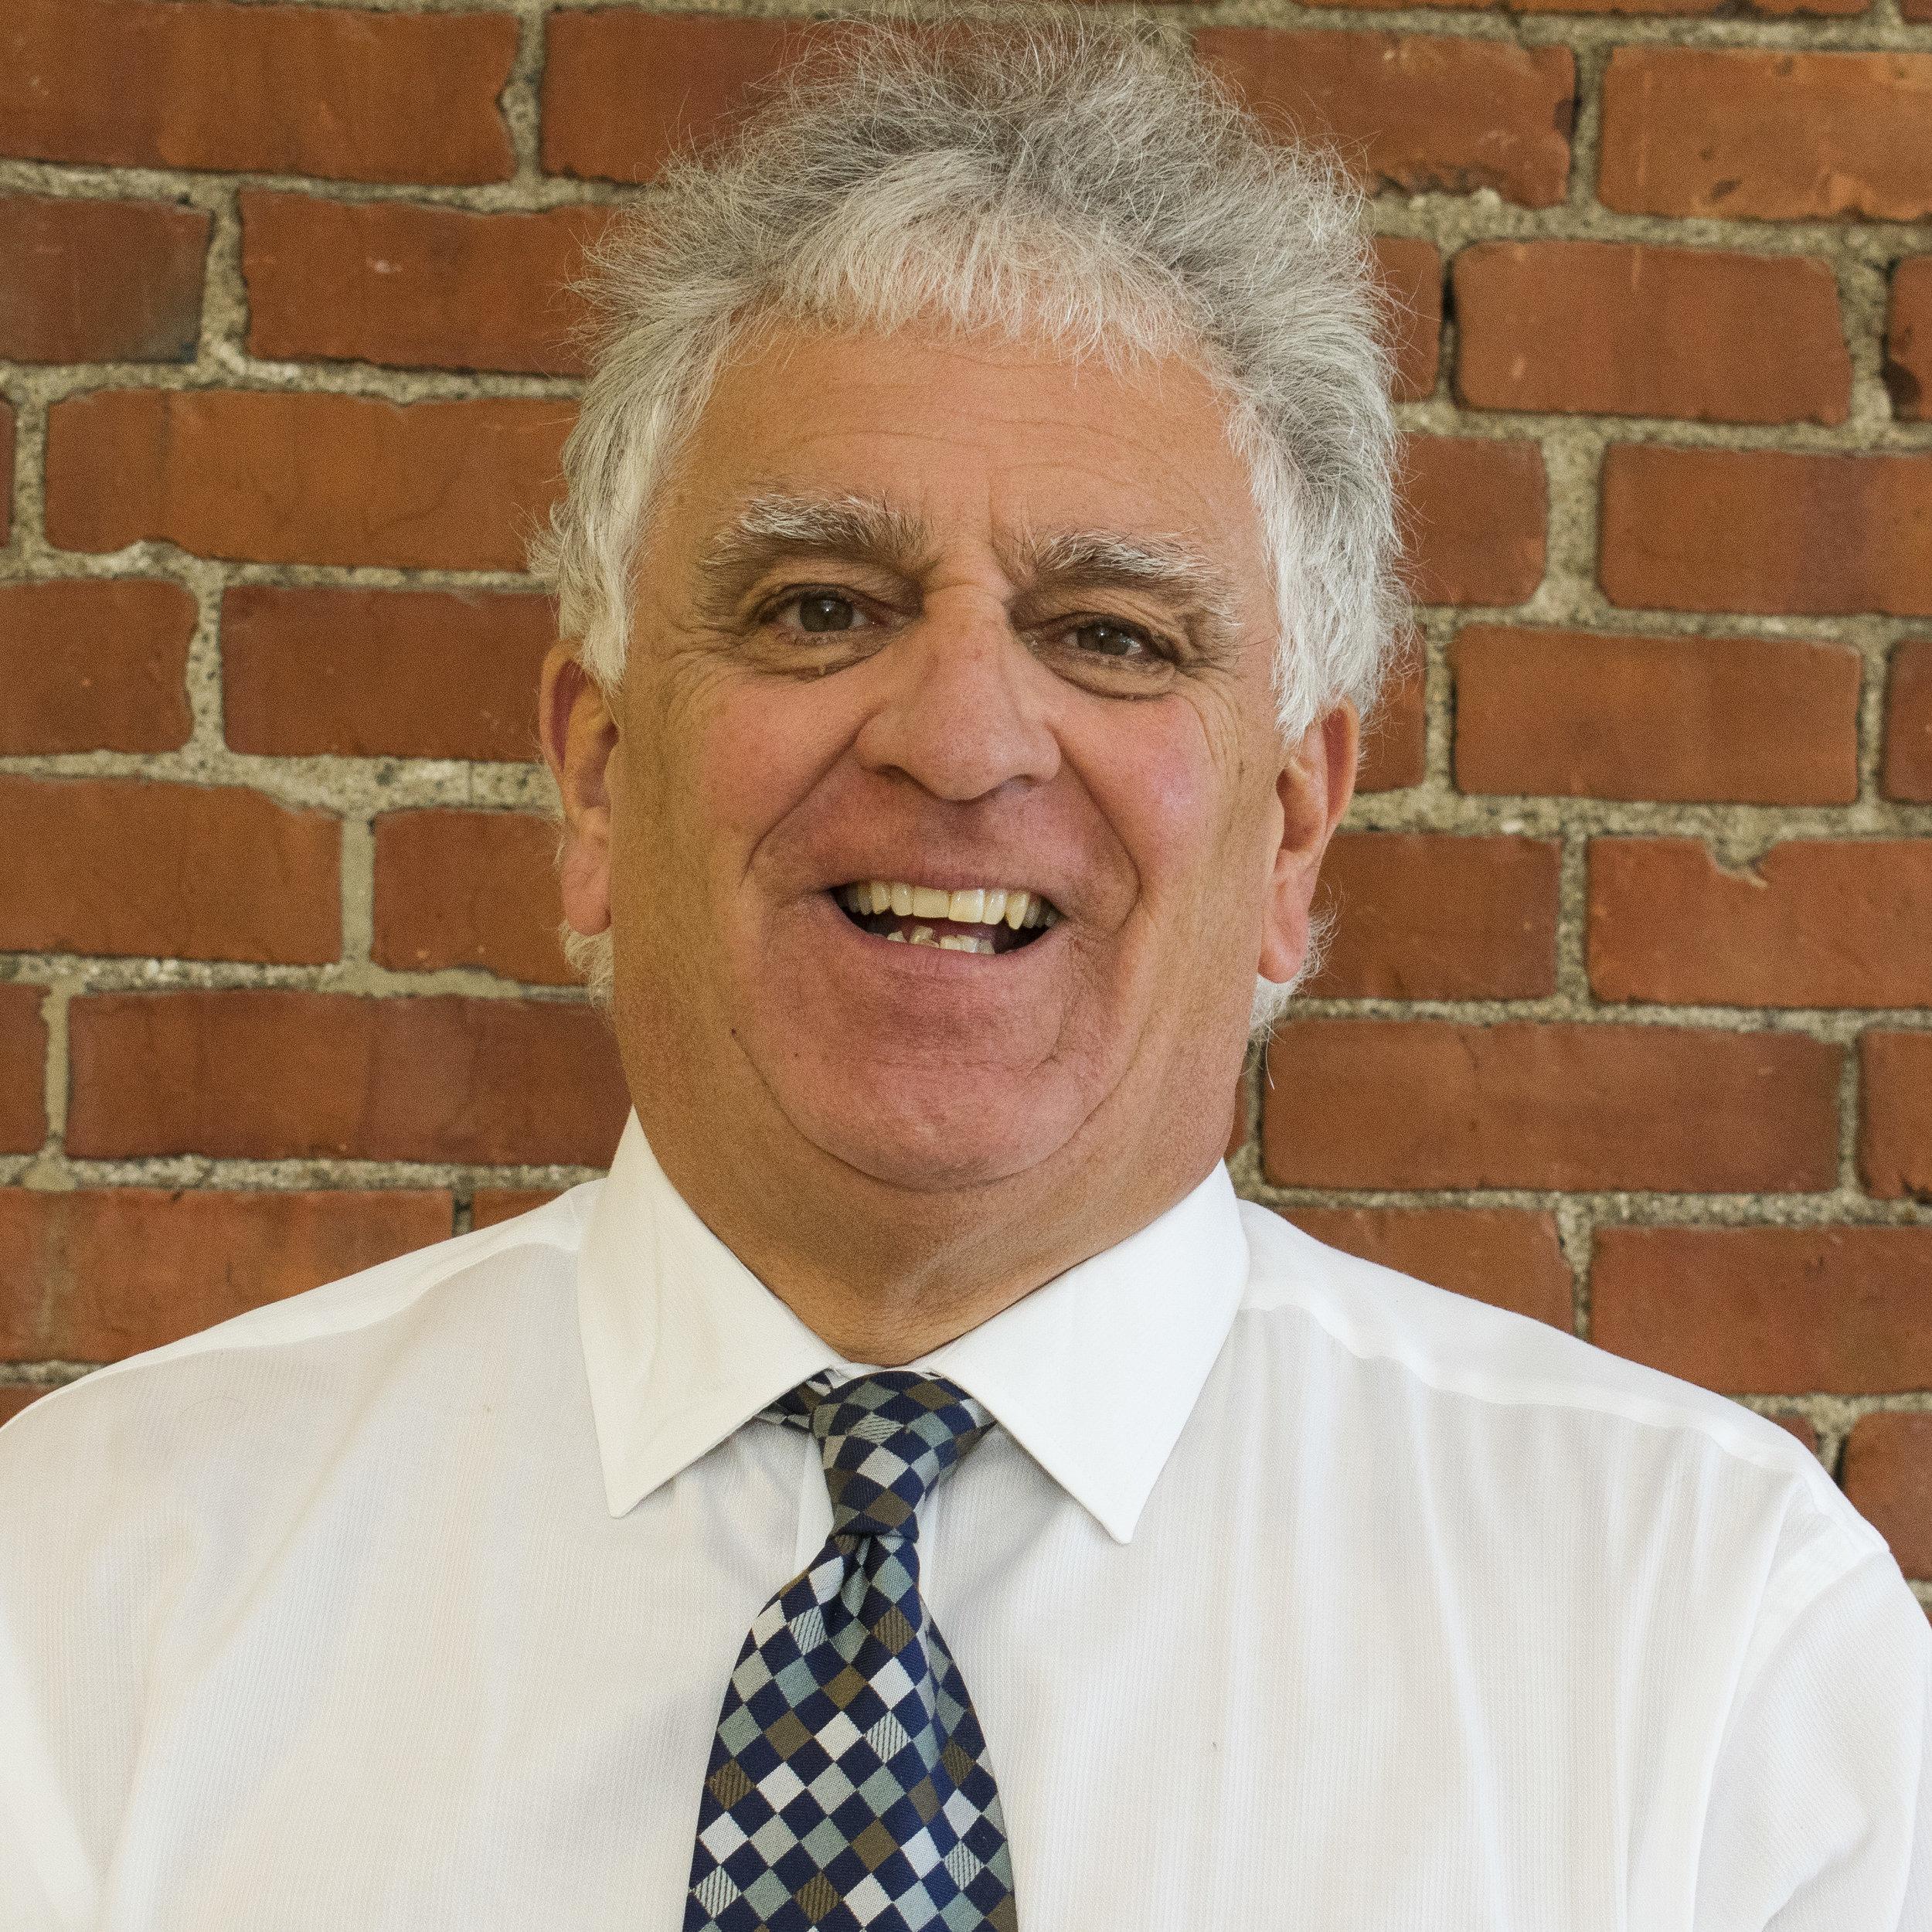 James Cassetta, President & CEO